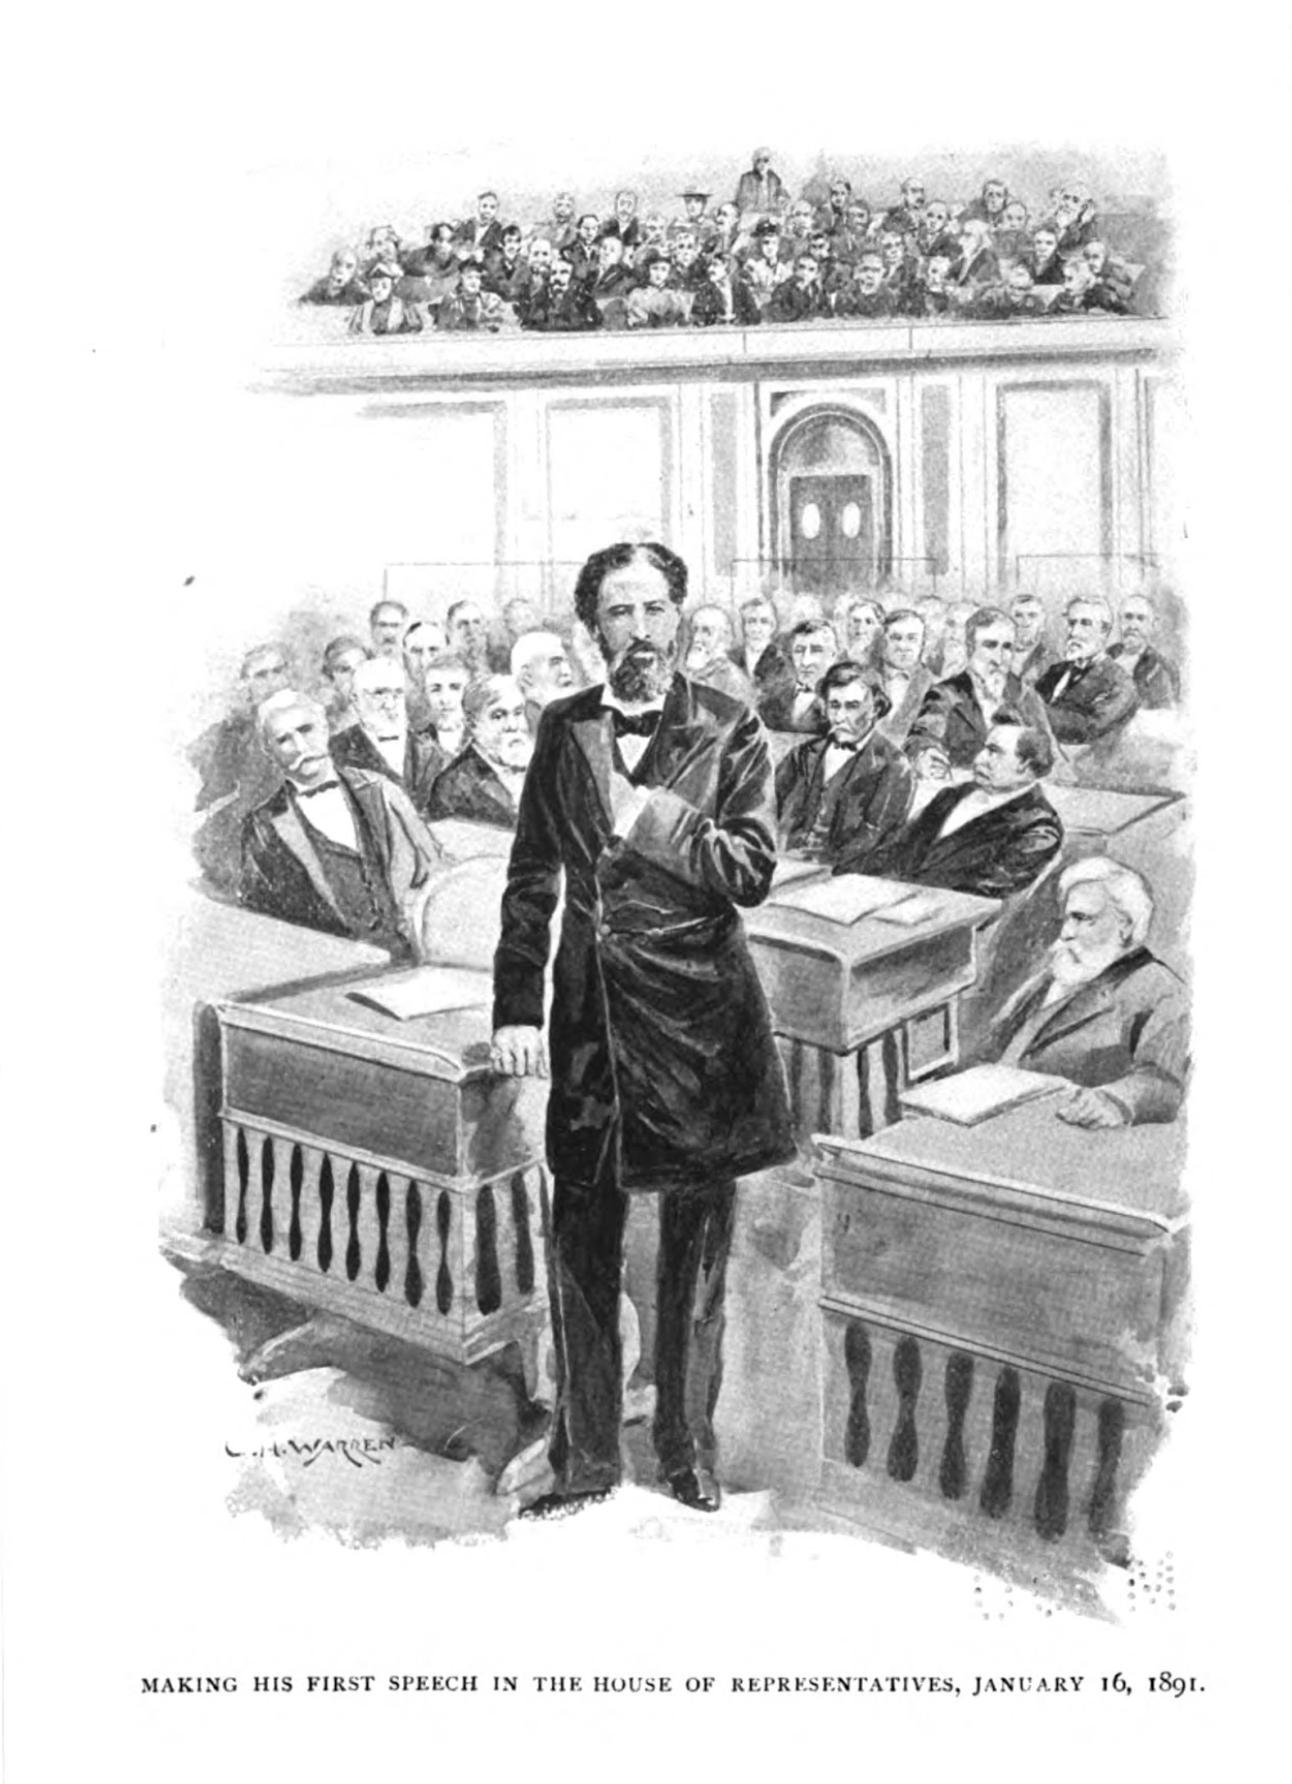 John Mercer Langston - Making his first speech in the House of Representatives, January 16, 1891